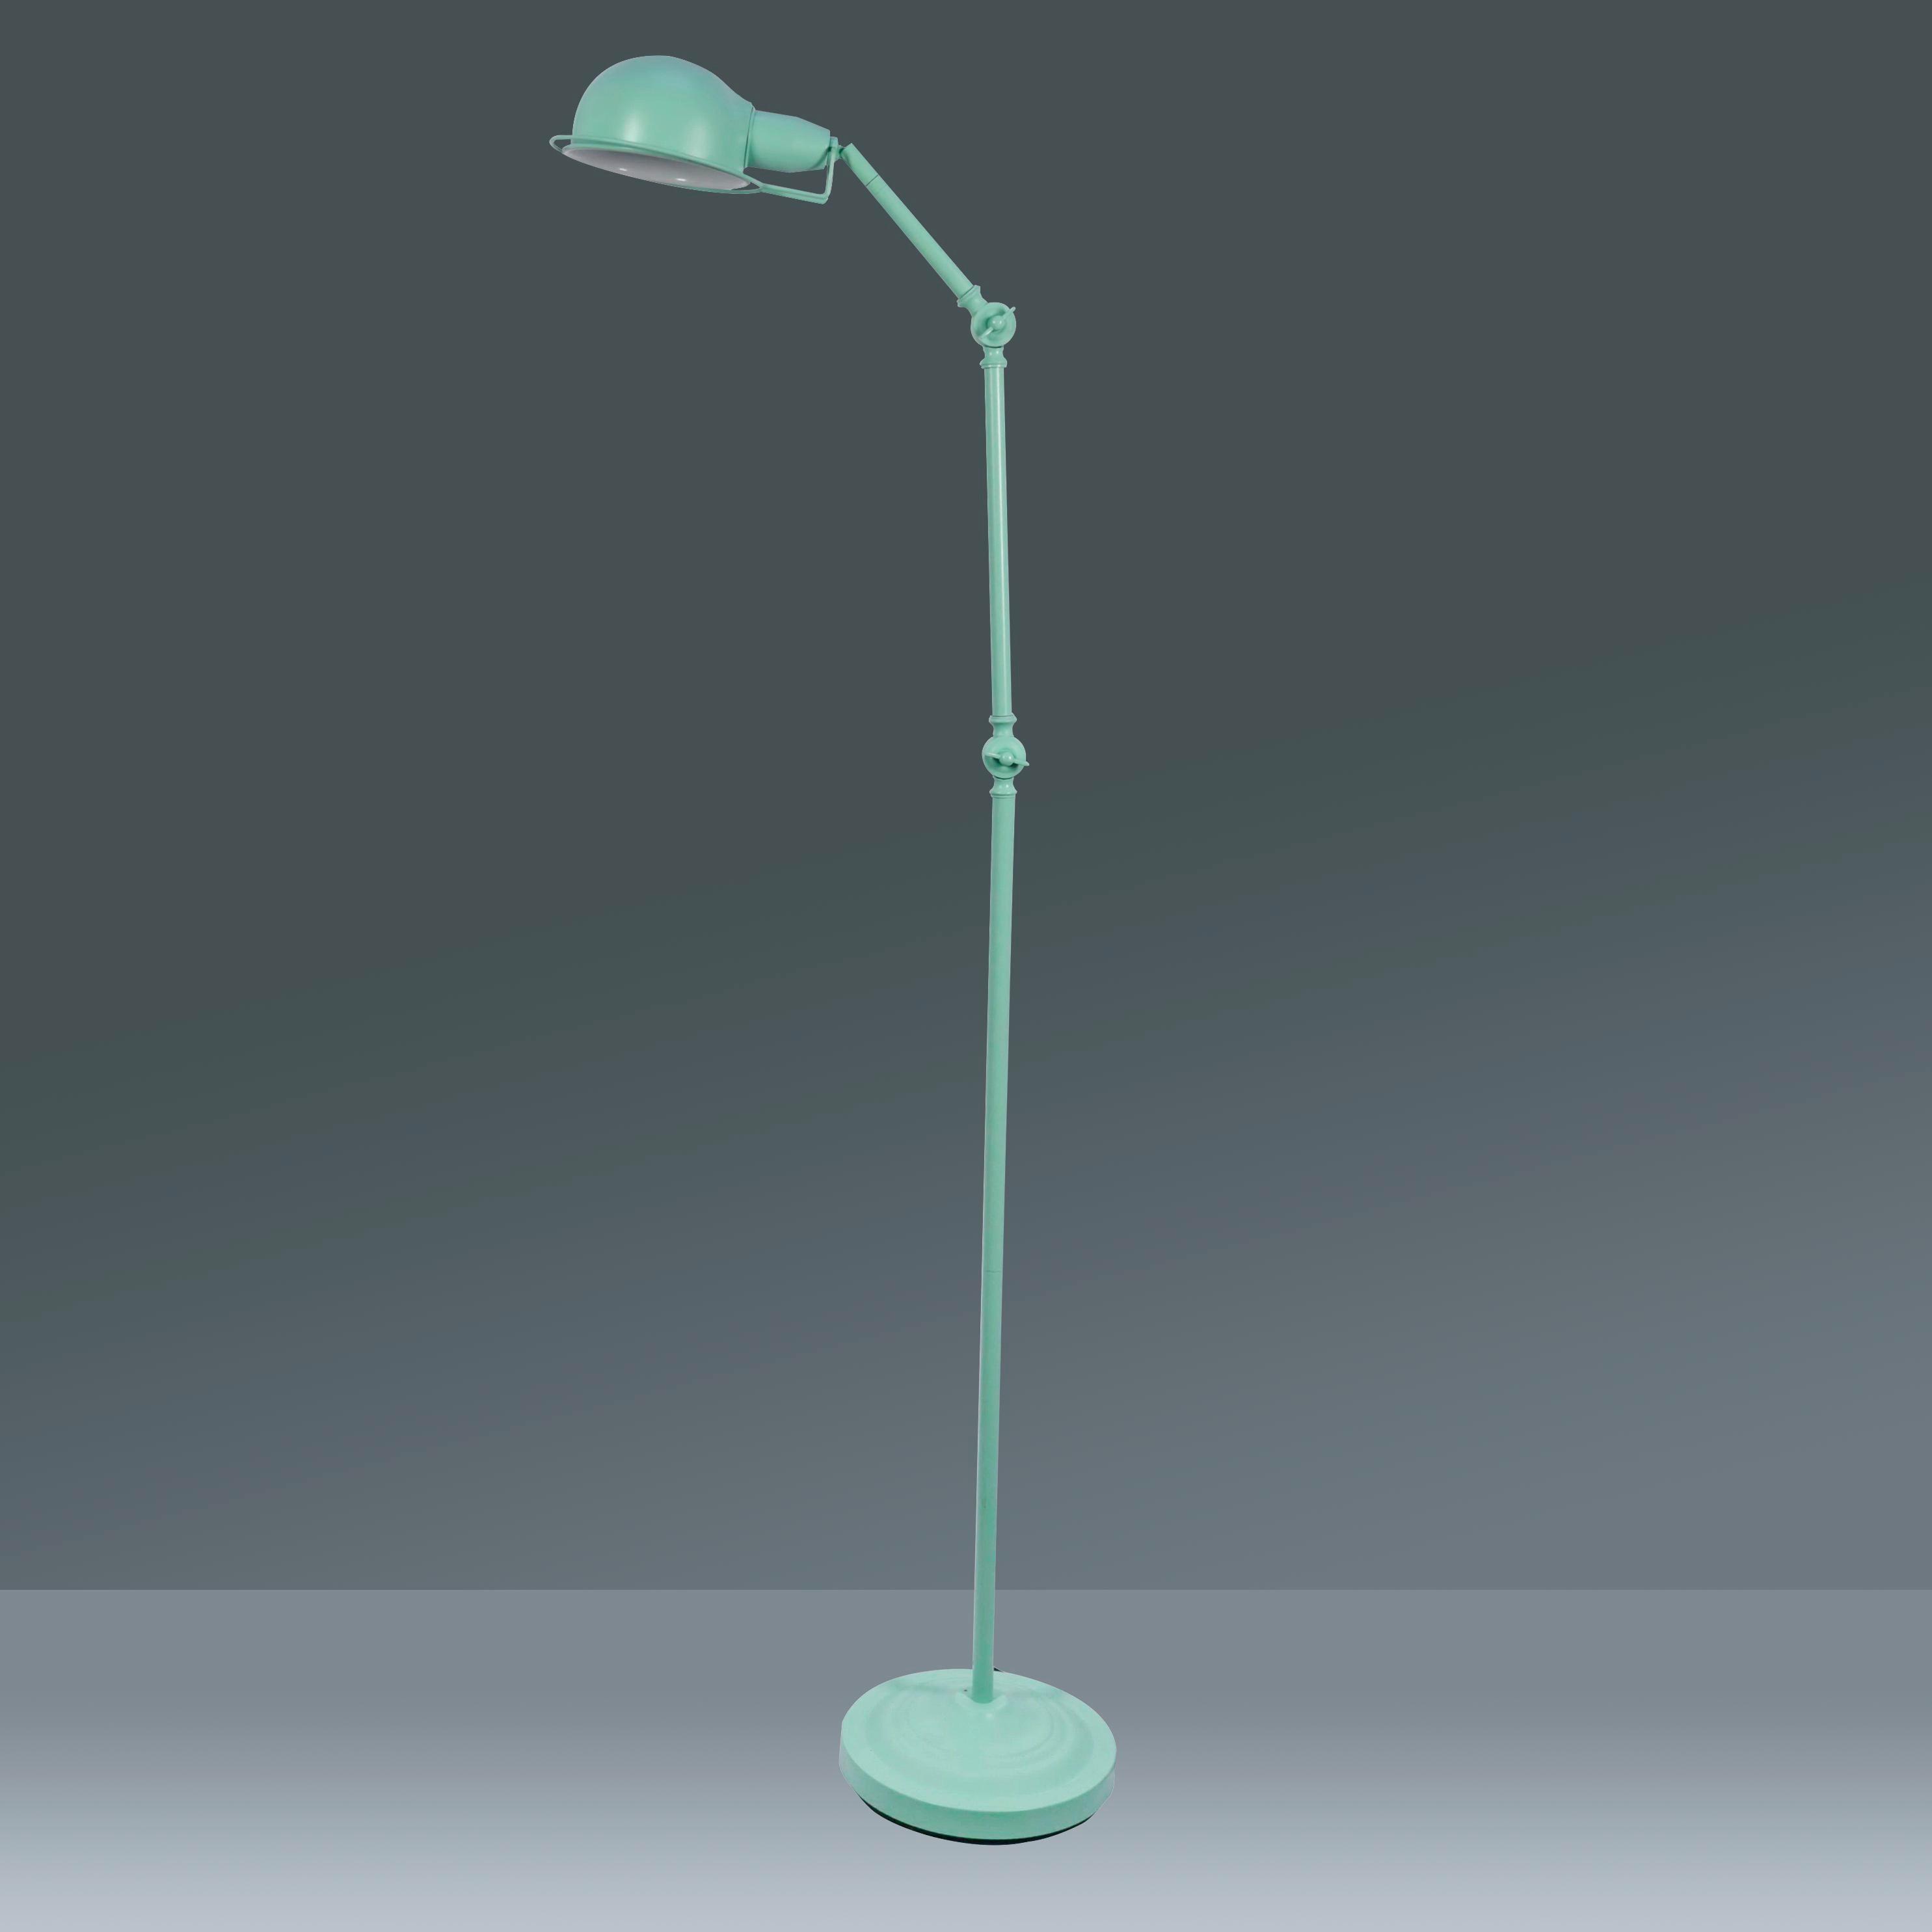 Stehleuchte Pax, max. 40 Watt - Türkis, ROMANTIK / LANDHAUS, Metall (40/150cm) - MÖMAX modern living